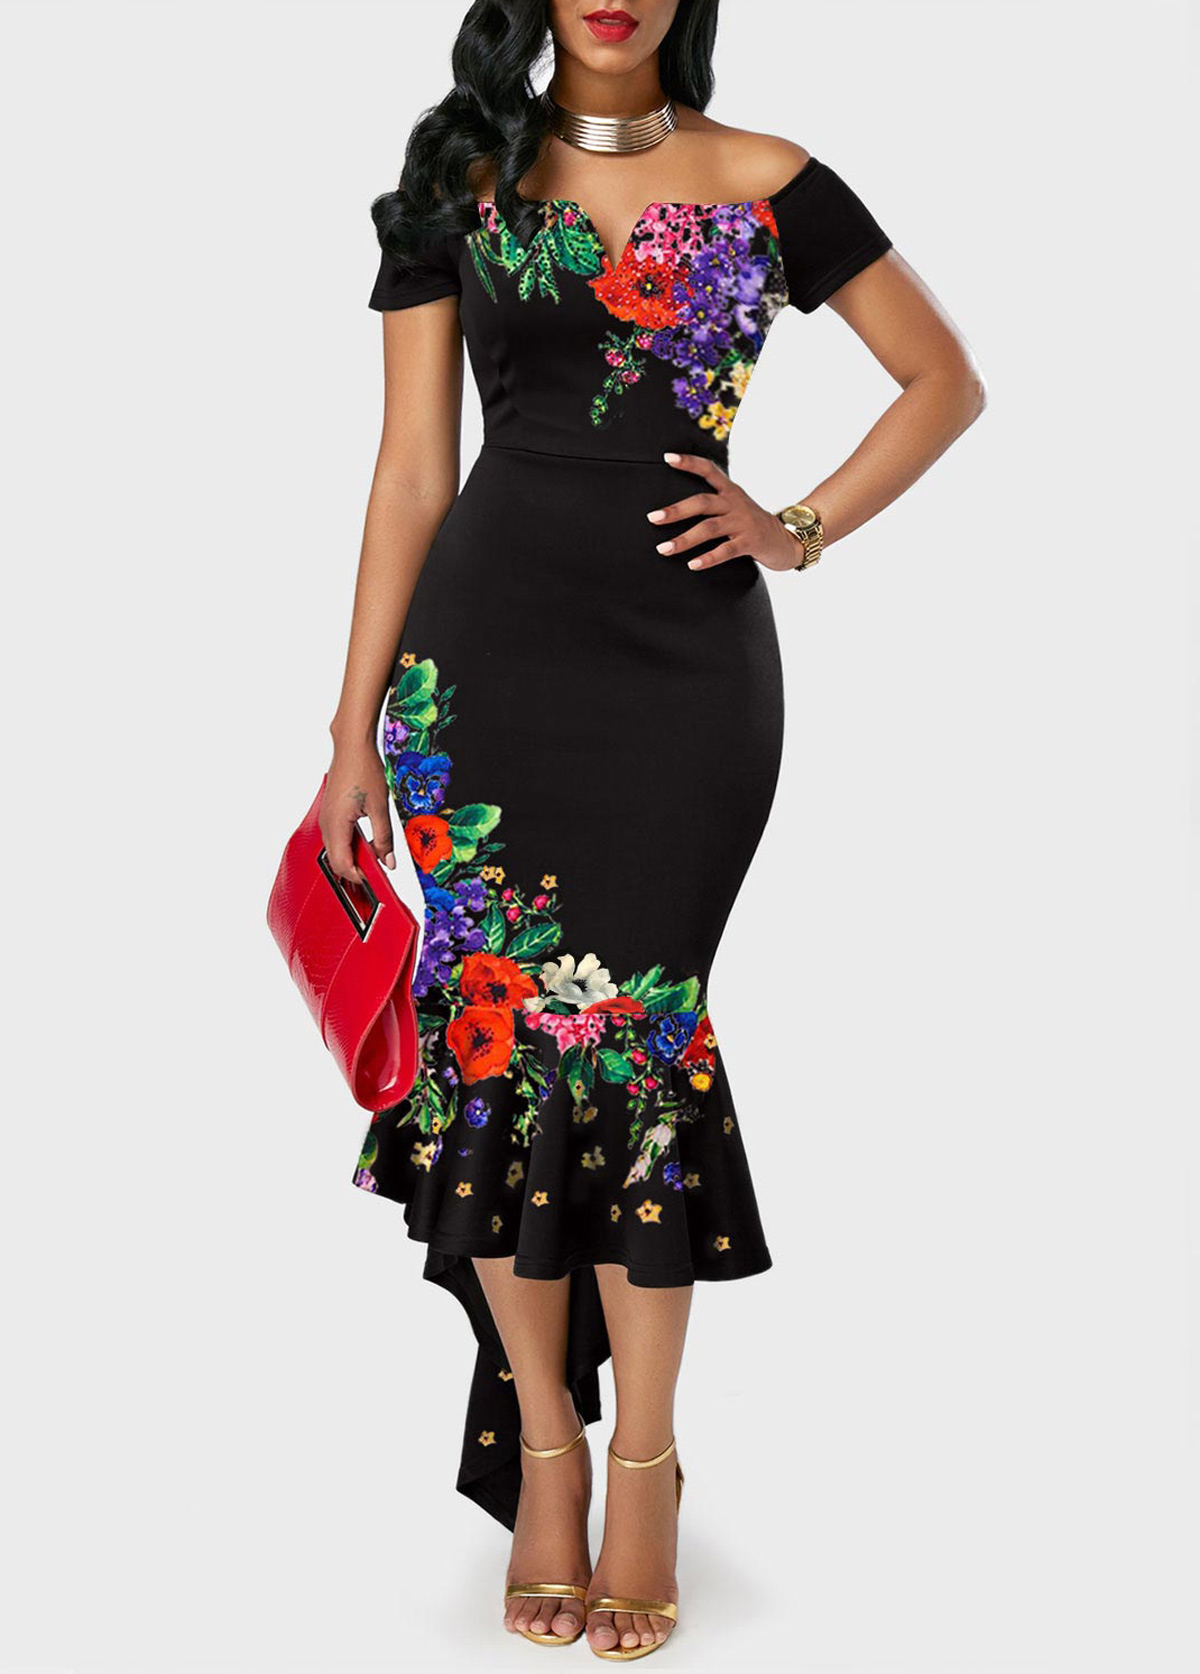 ROTITA Off the Shoulder Floral Print Mermaid Dress